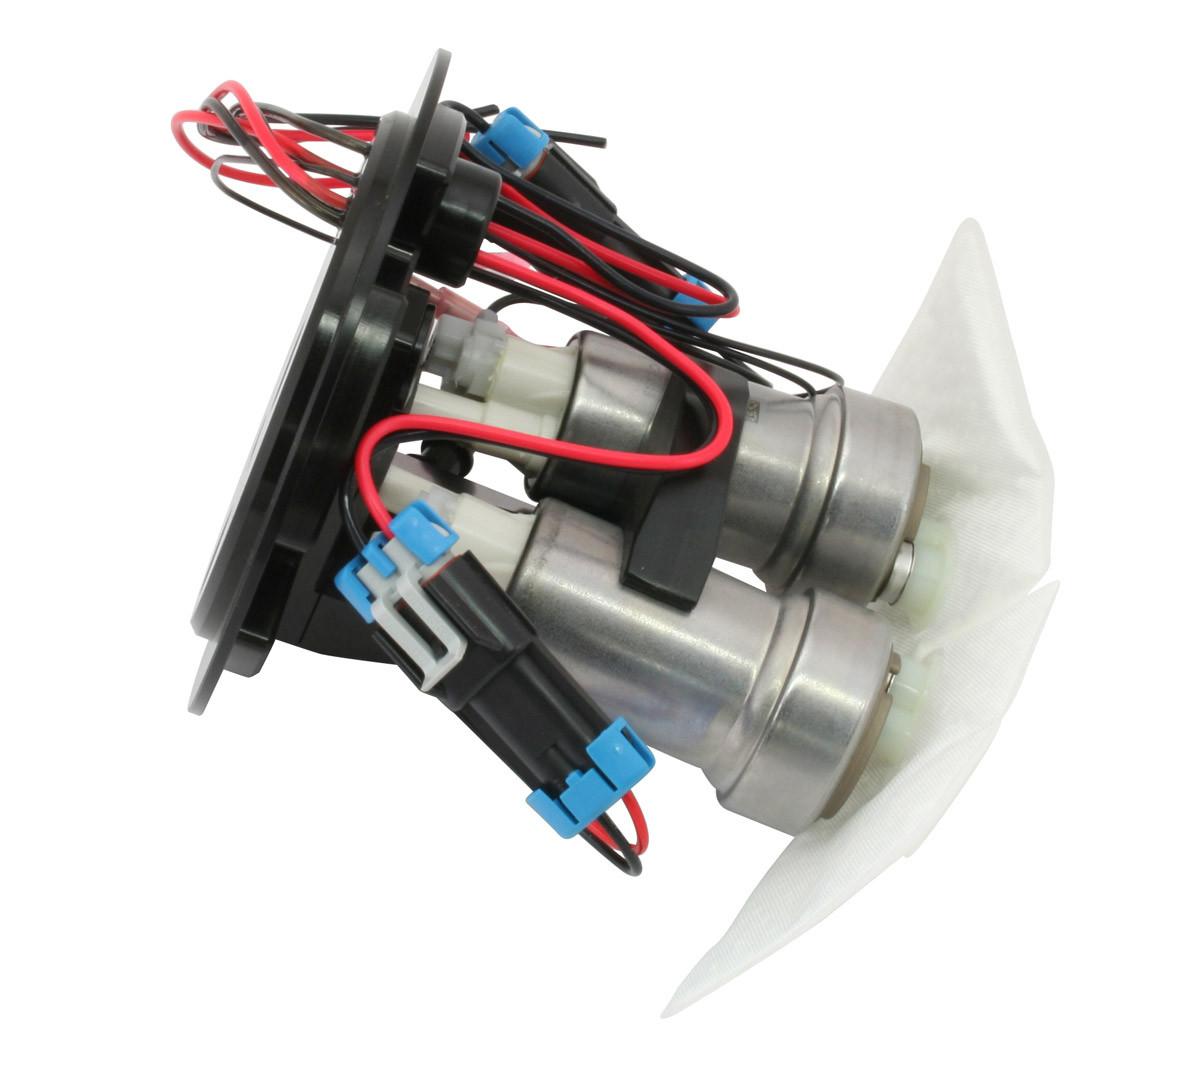 Agp Turbochargers Inc Store